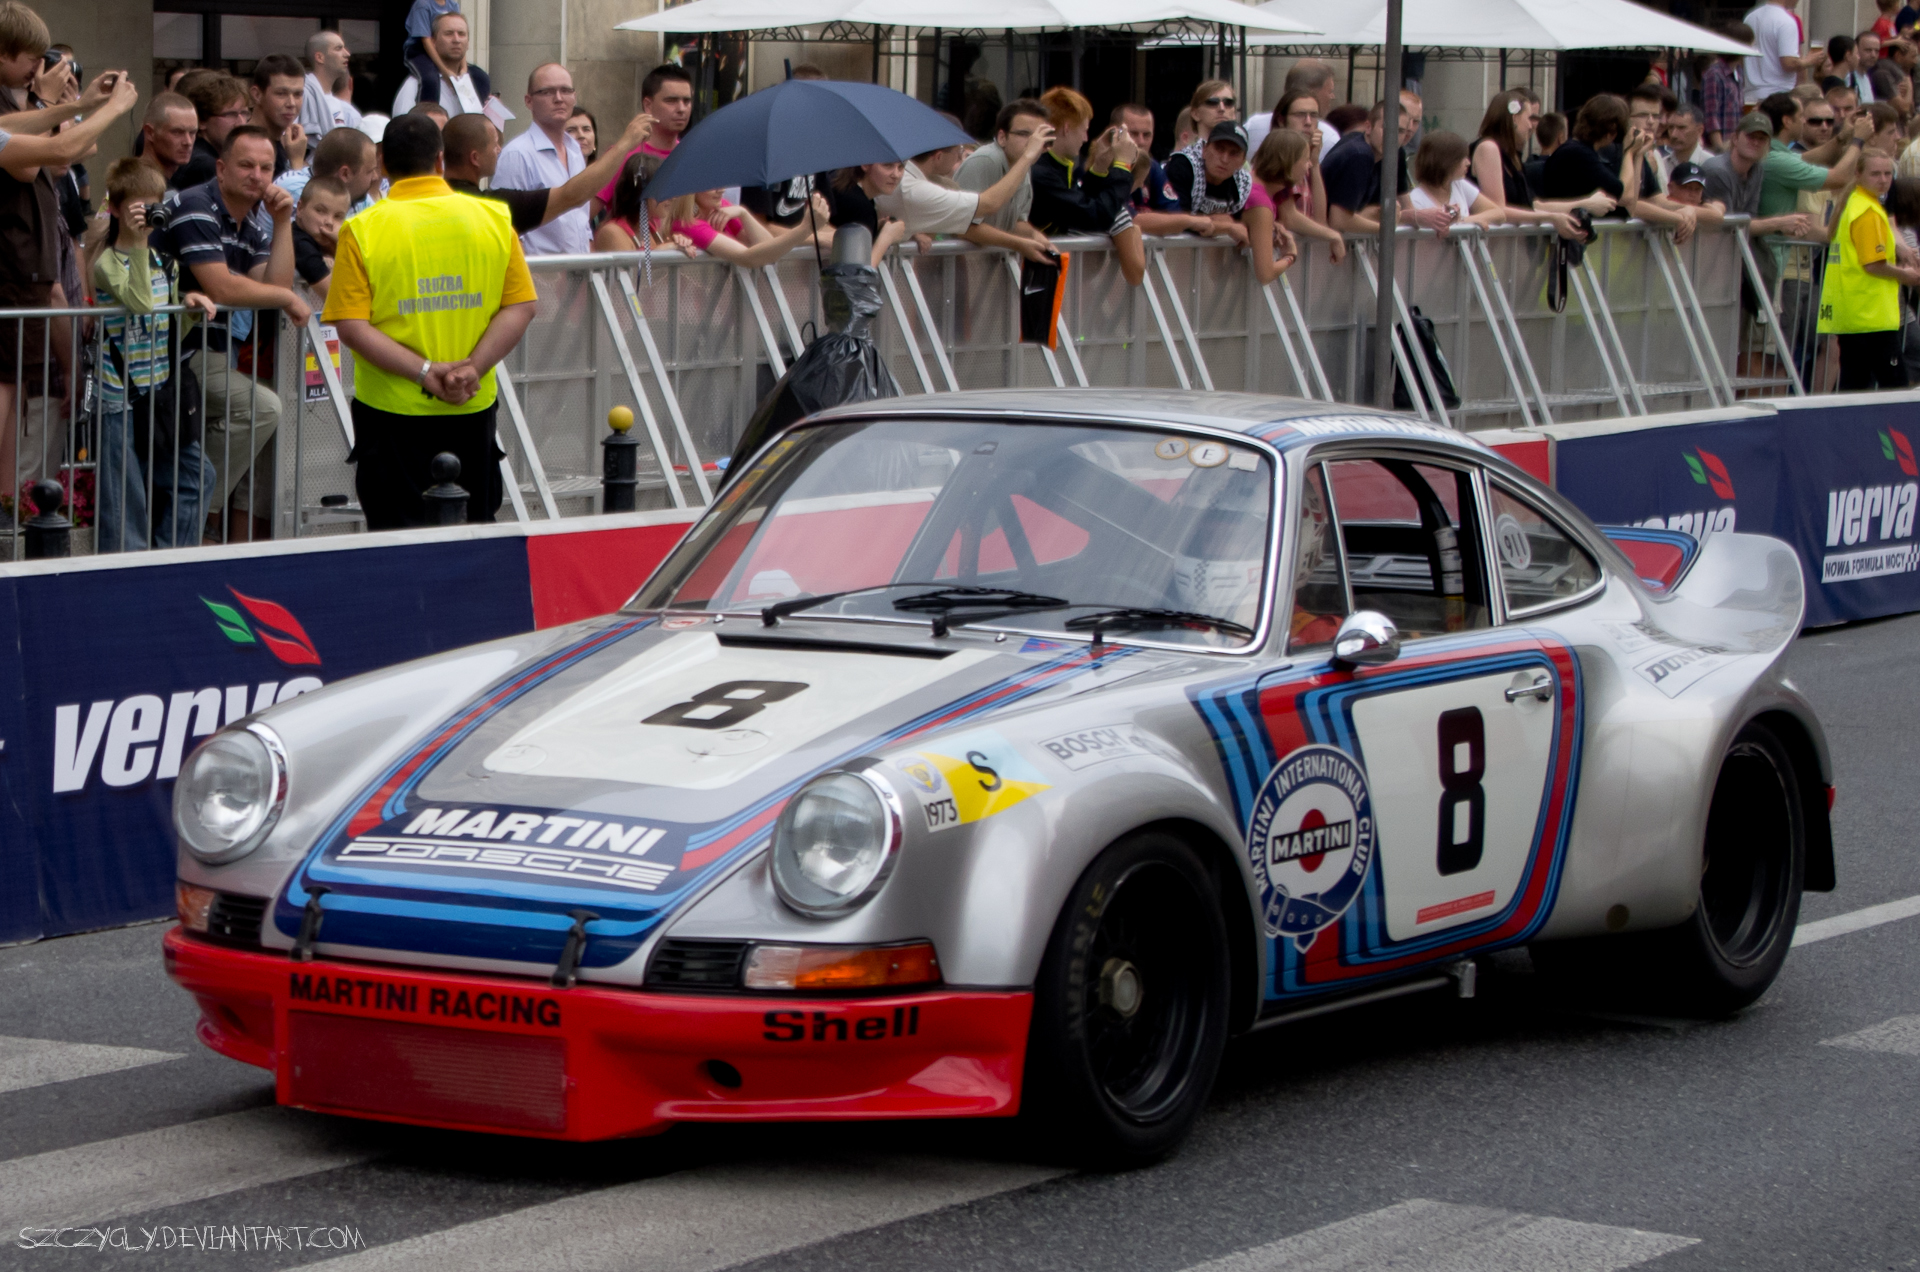 Porsche 911 Martini Racing By Szczygly On Deviantart